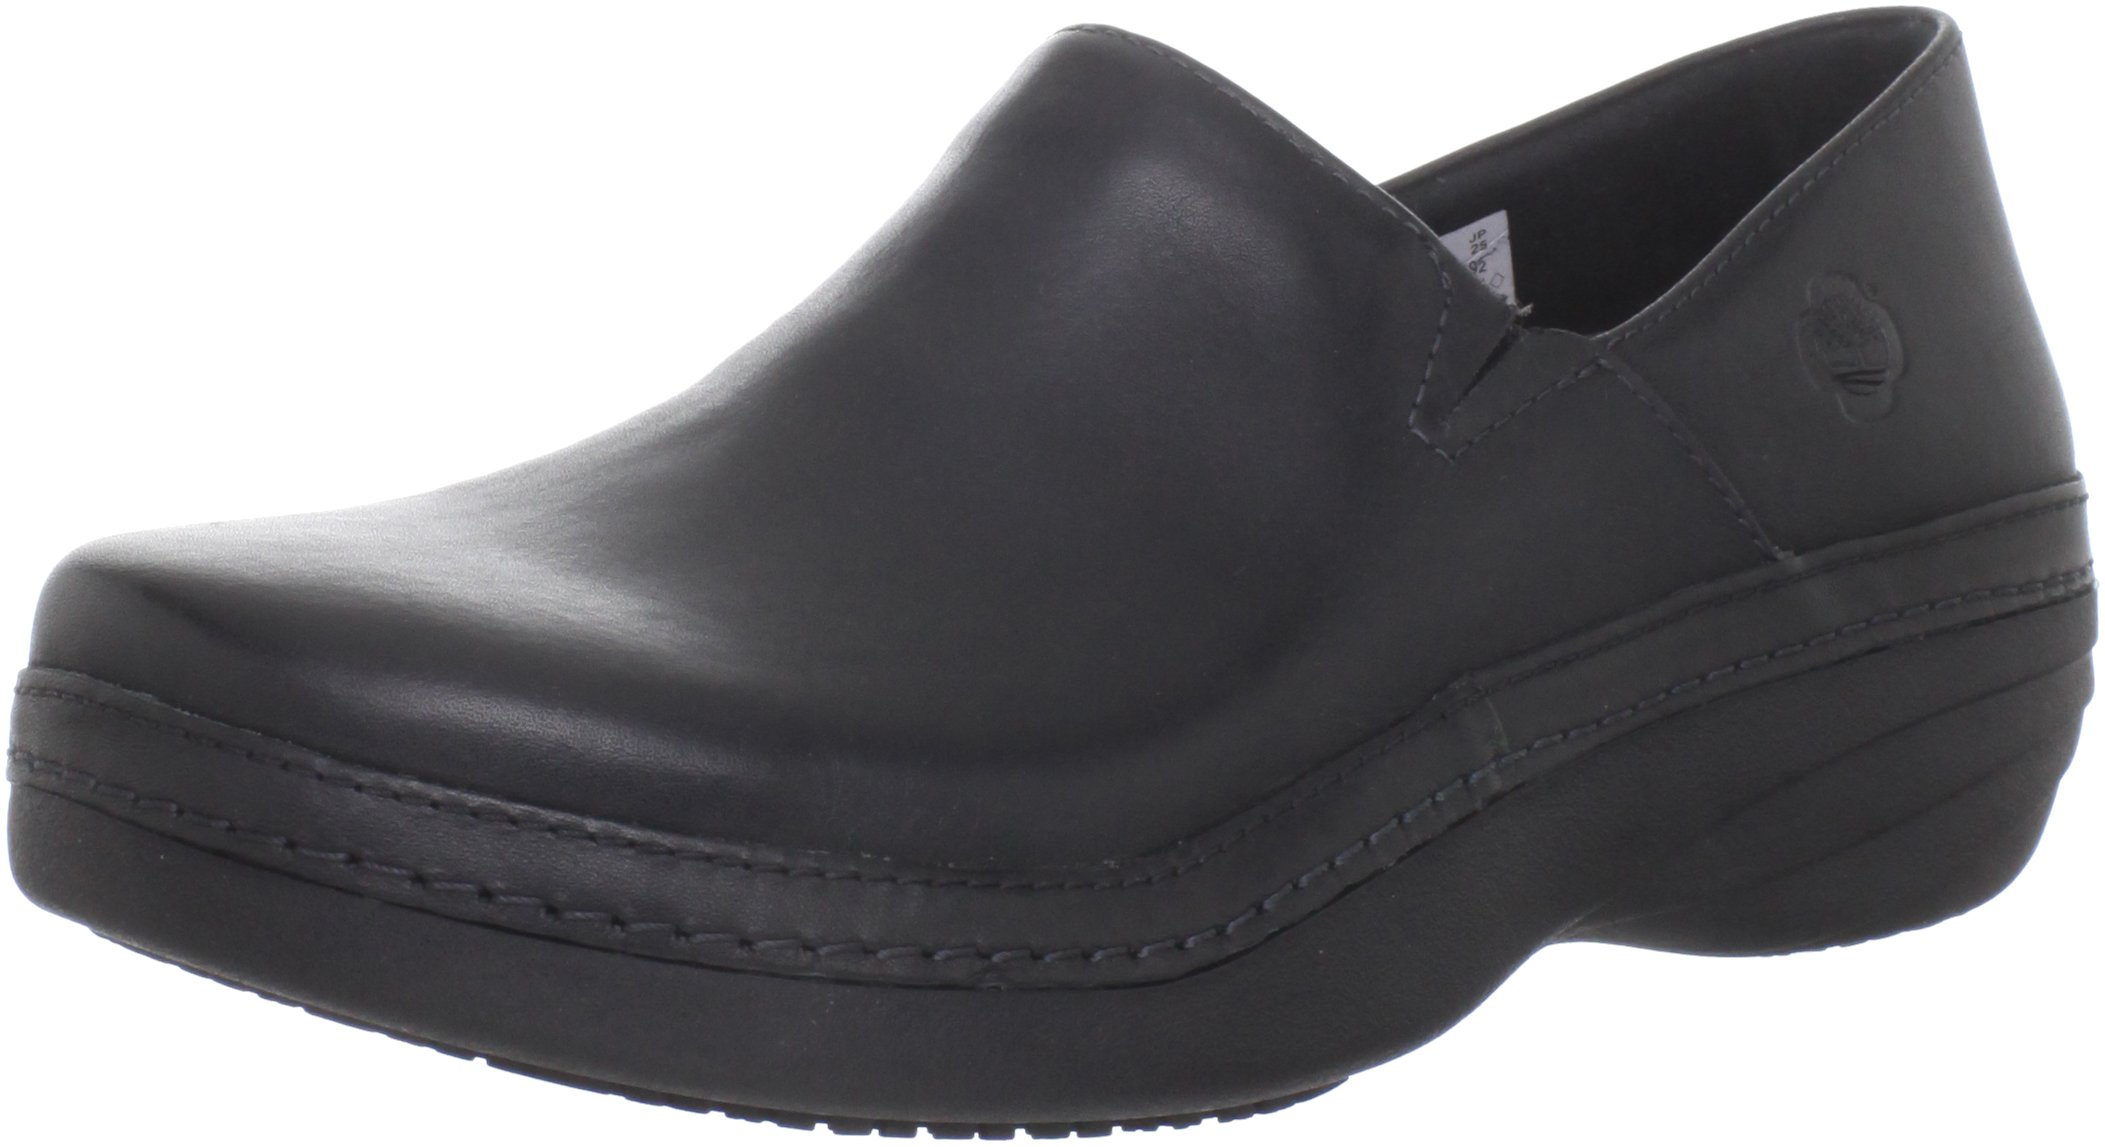 Timberland PRO Women's Renova Slip-On,Black,8.5 M US